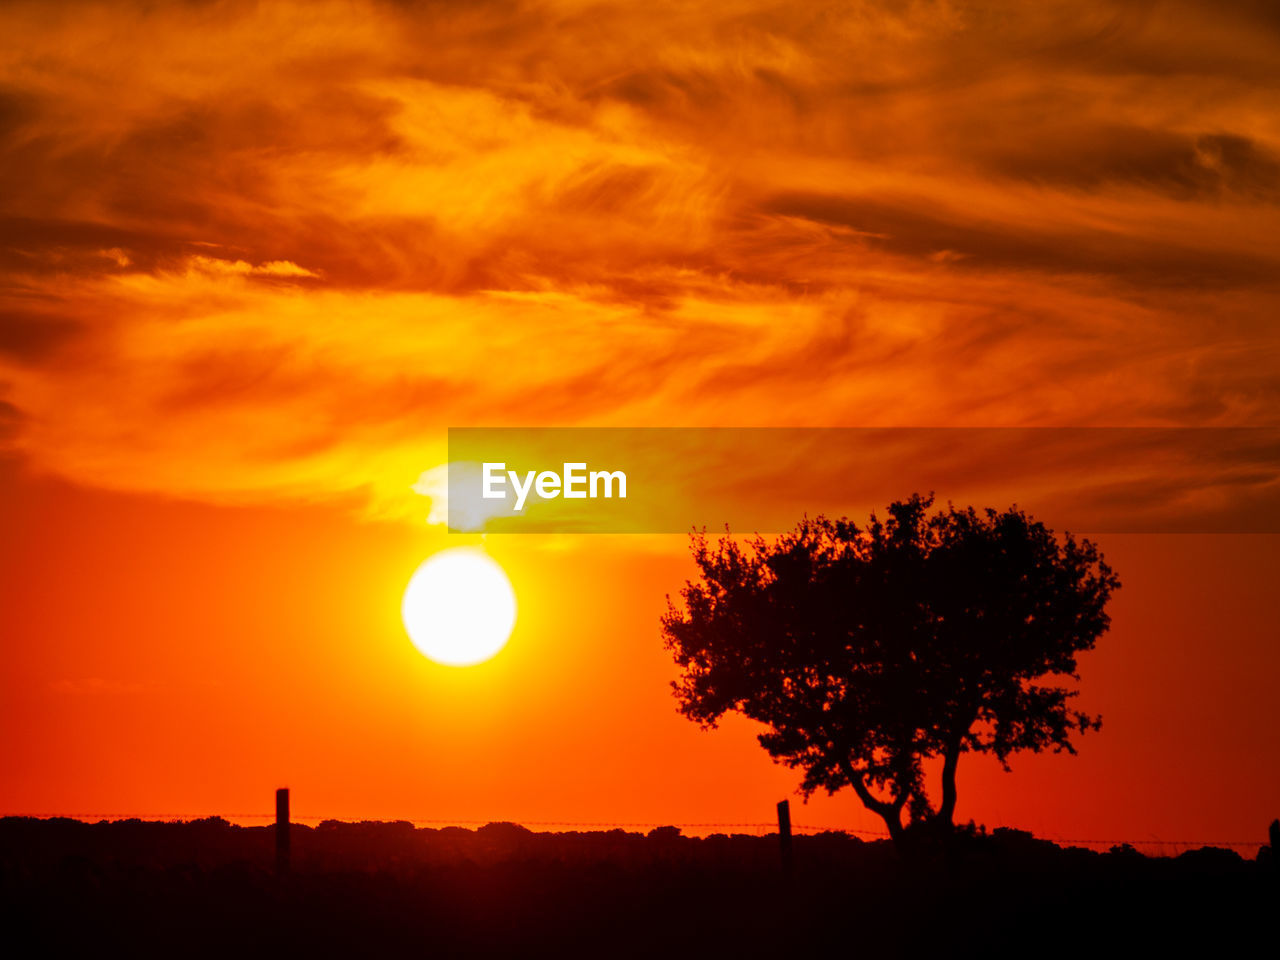 sunset, orange color, sky, silhouette, beauty in nature, scenics - nature, sun, tree, tranquility, tranquil scene, plant, idyllic, nature, cloud - sky, environment, no people, non-urban scene, sunlight, landscape, outdoors, romantic sky